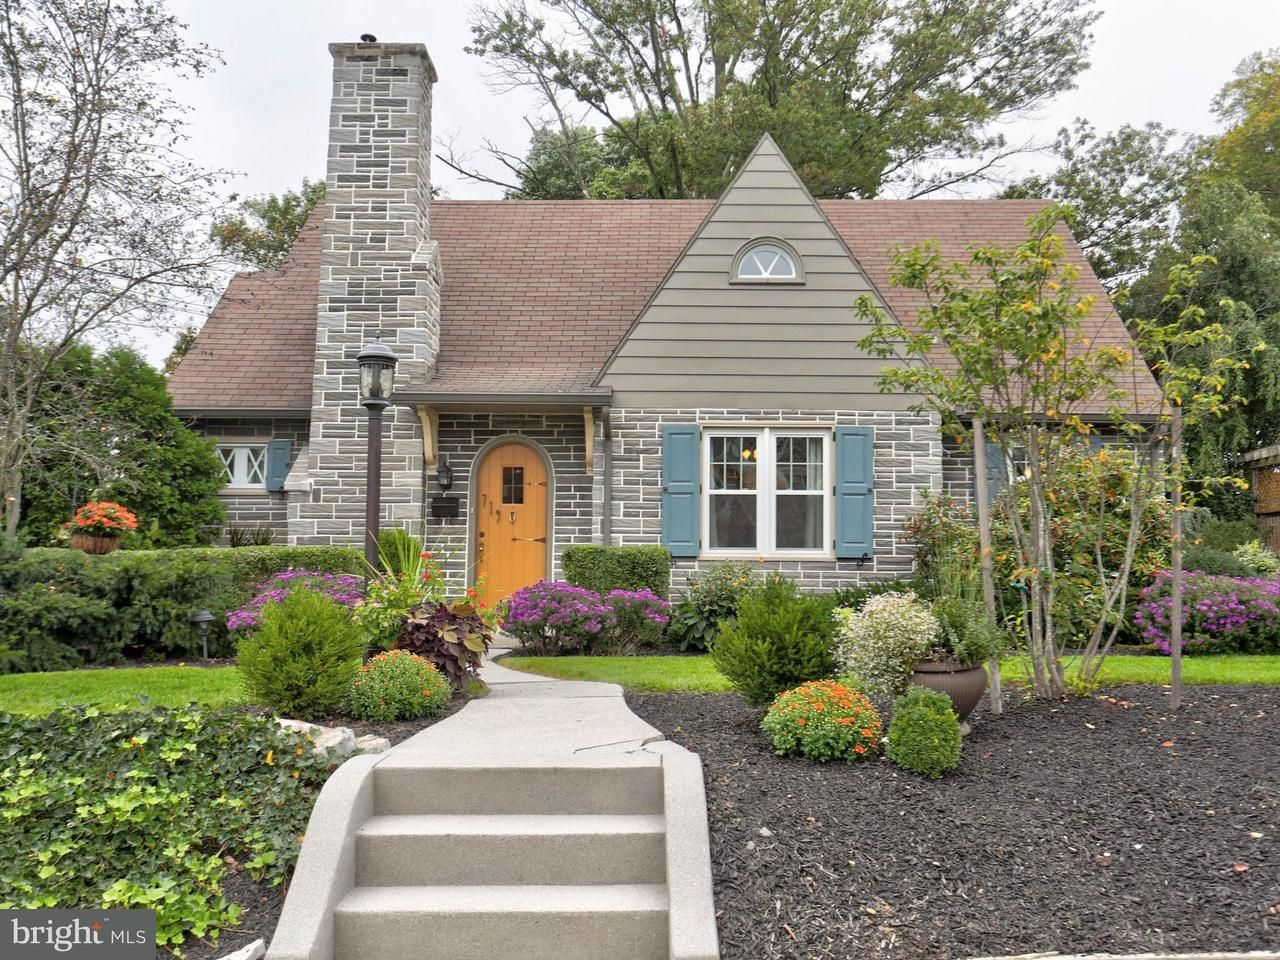 719 S Spruce St Elizabethtown Pa 17022 Mls 1000306566 Movoto Com Family House Elizabethtown Spruce